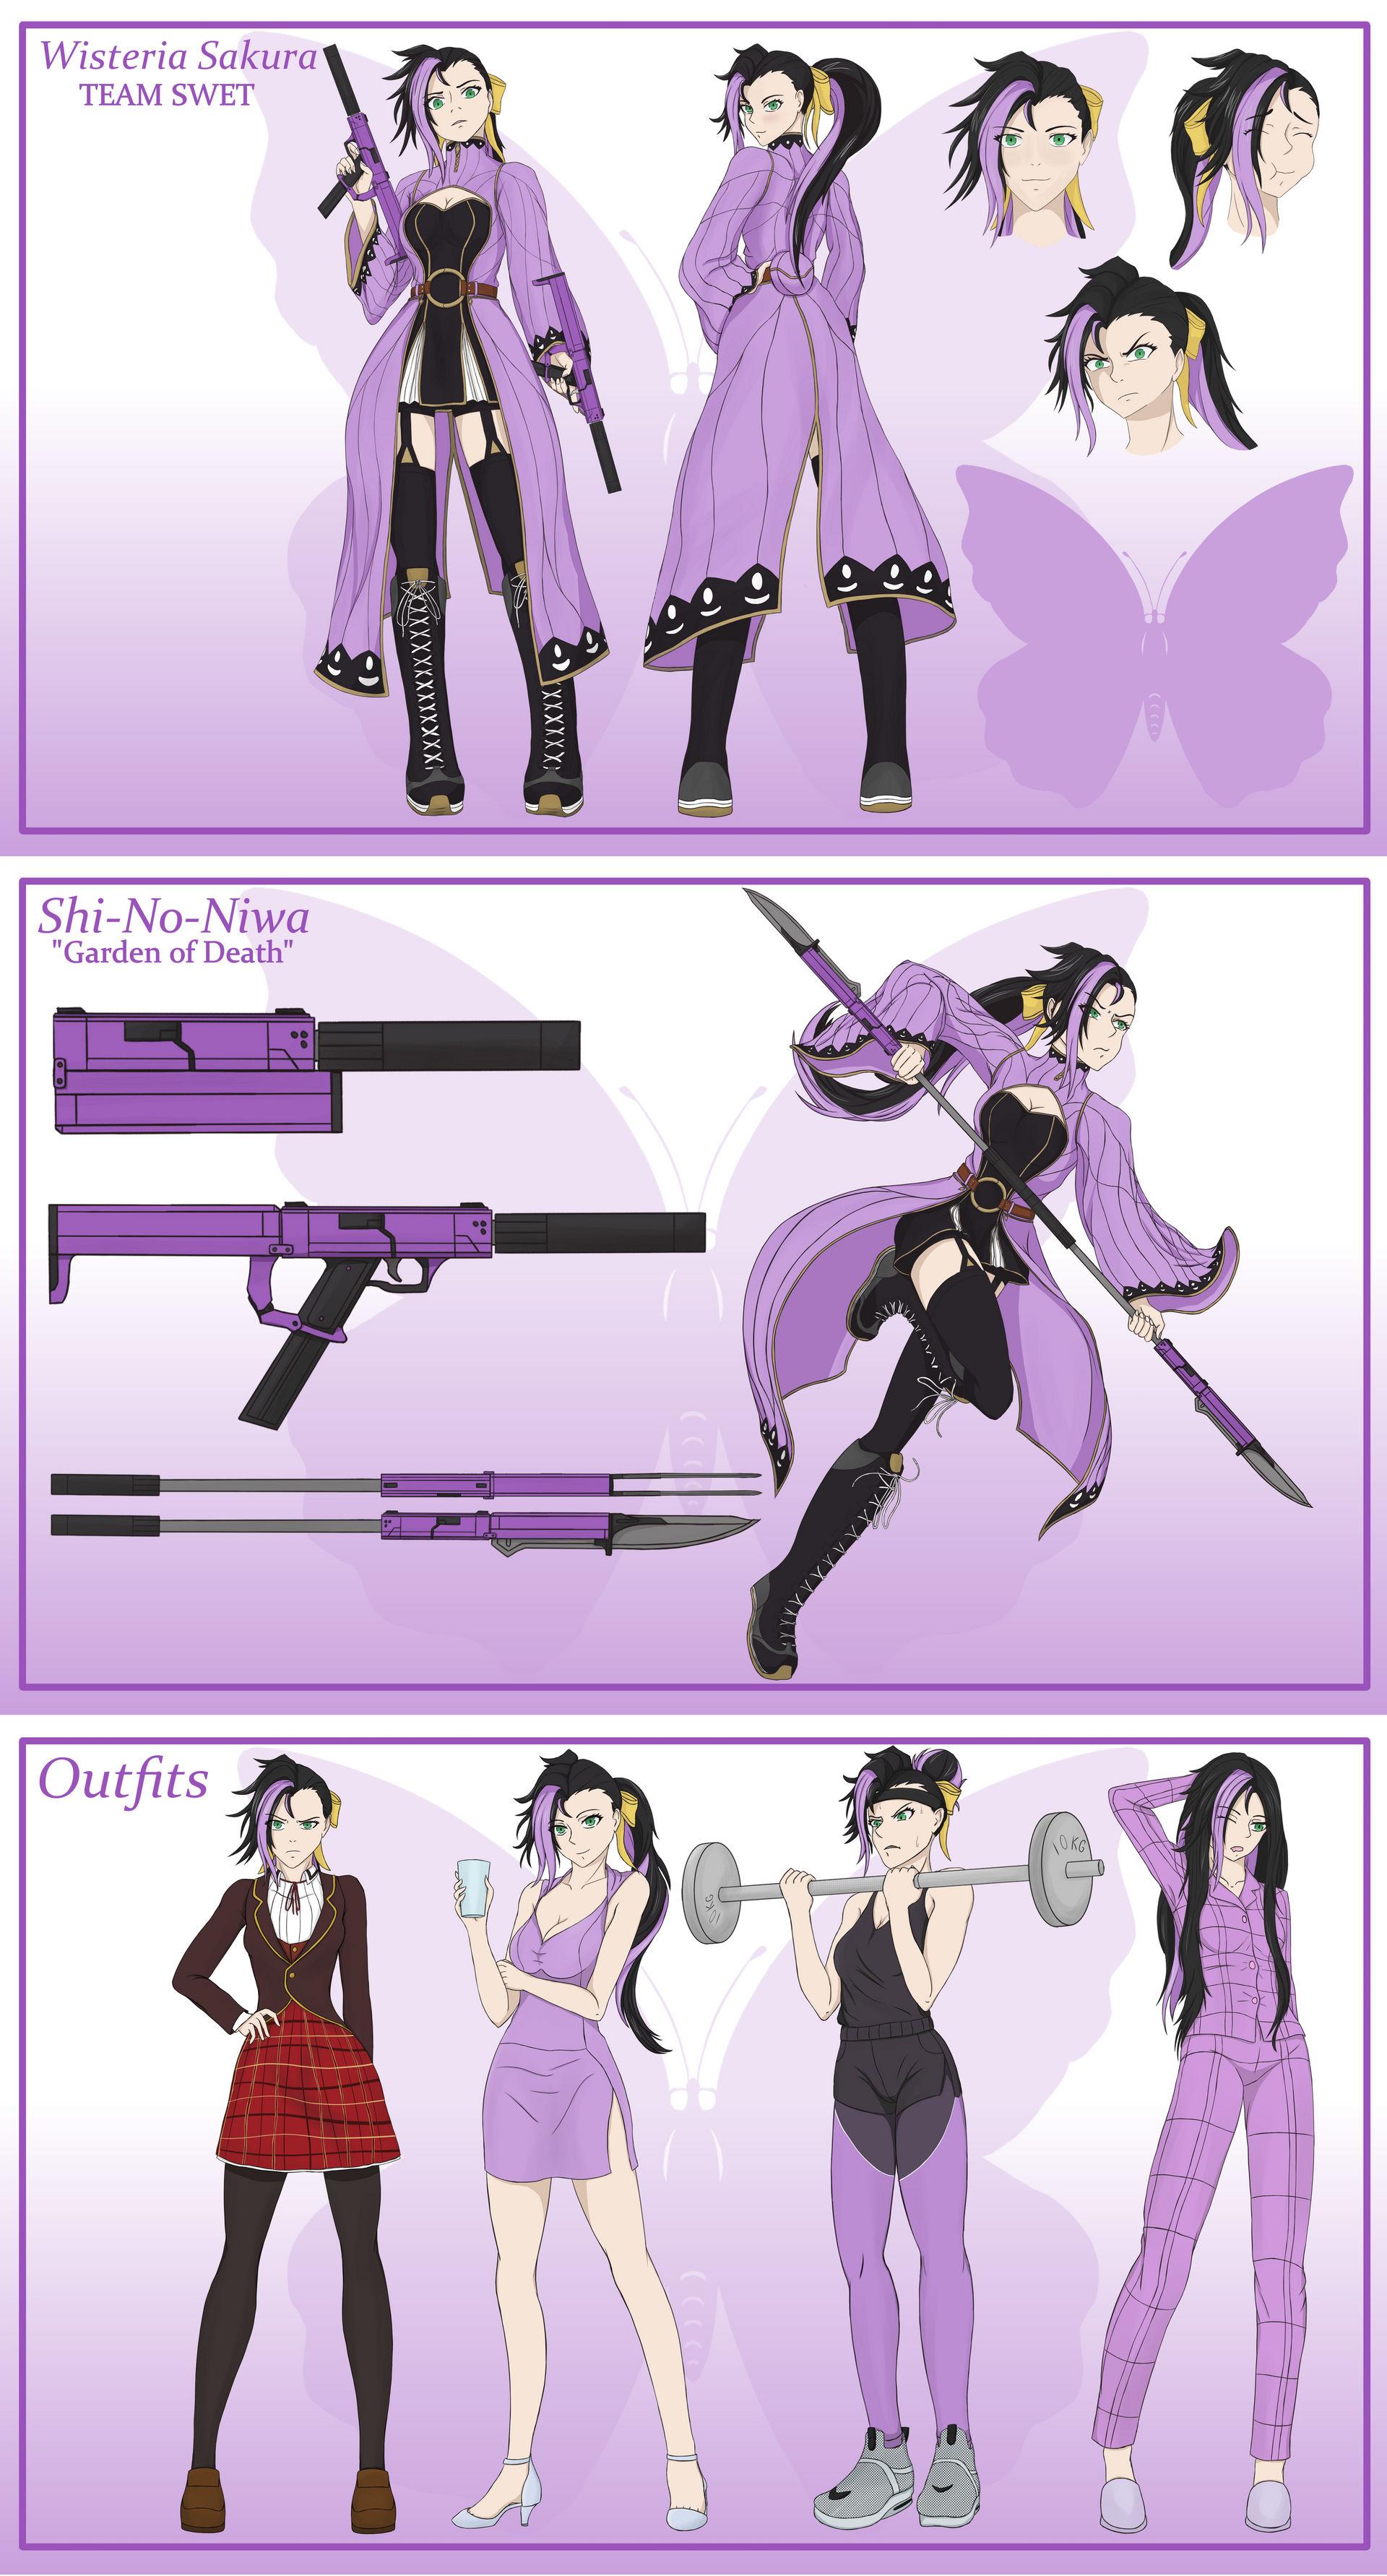 RWBY OC) Team SWET - Wisteria Sakura profile by Xsanaty on DeviantArt